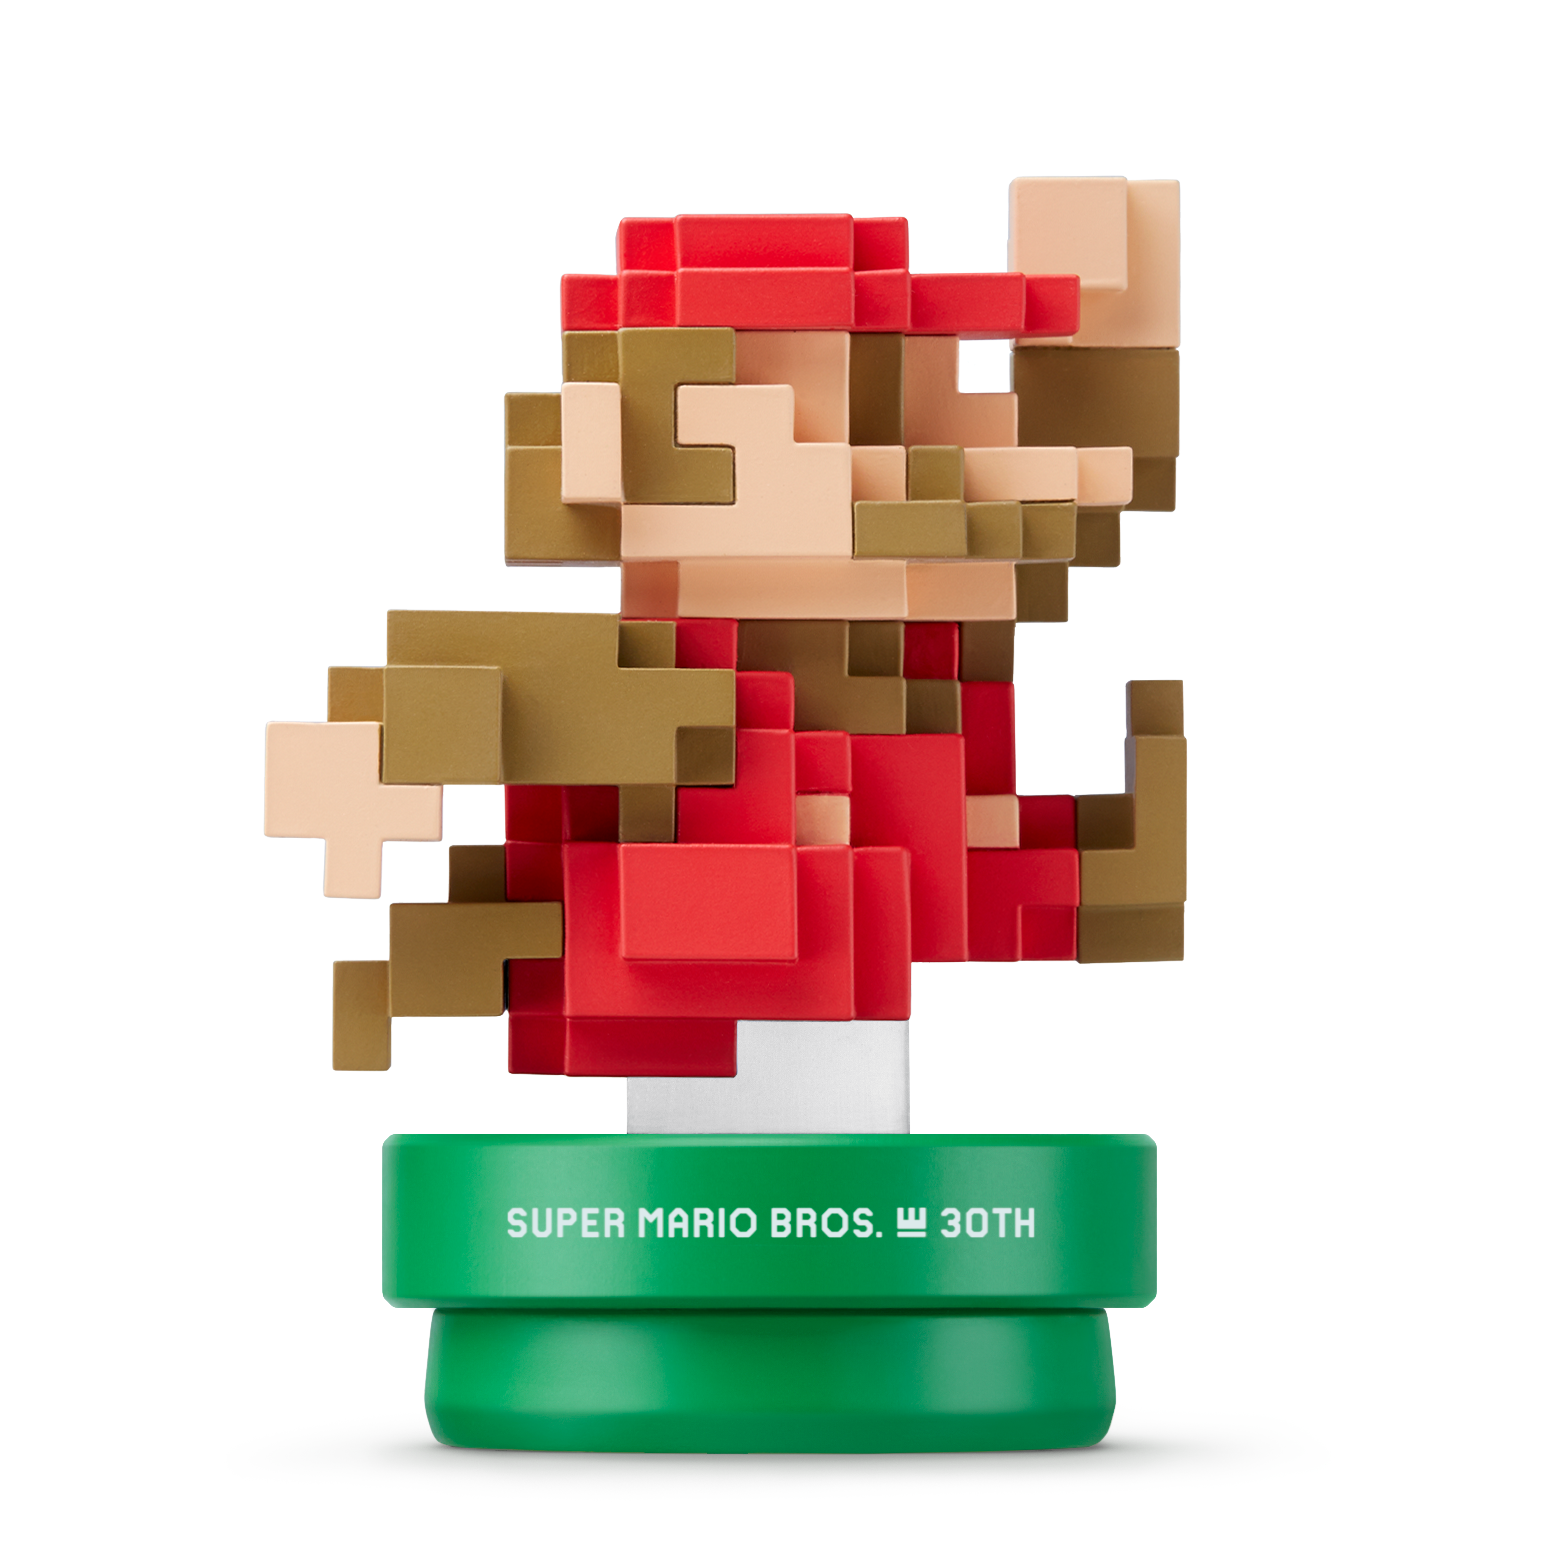 Amiibo/Mario 30th Anniversary Collection